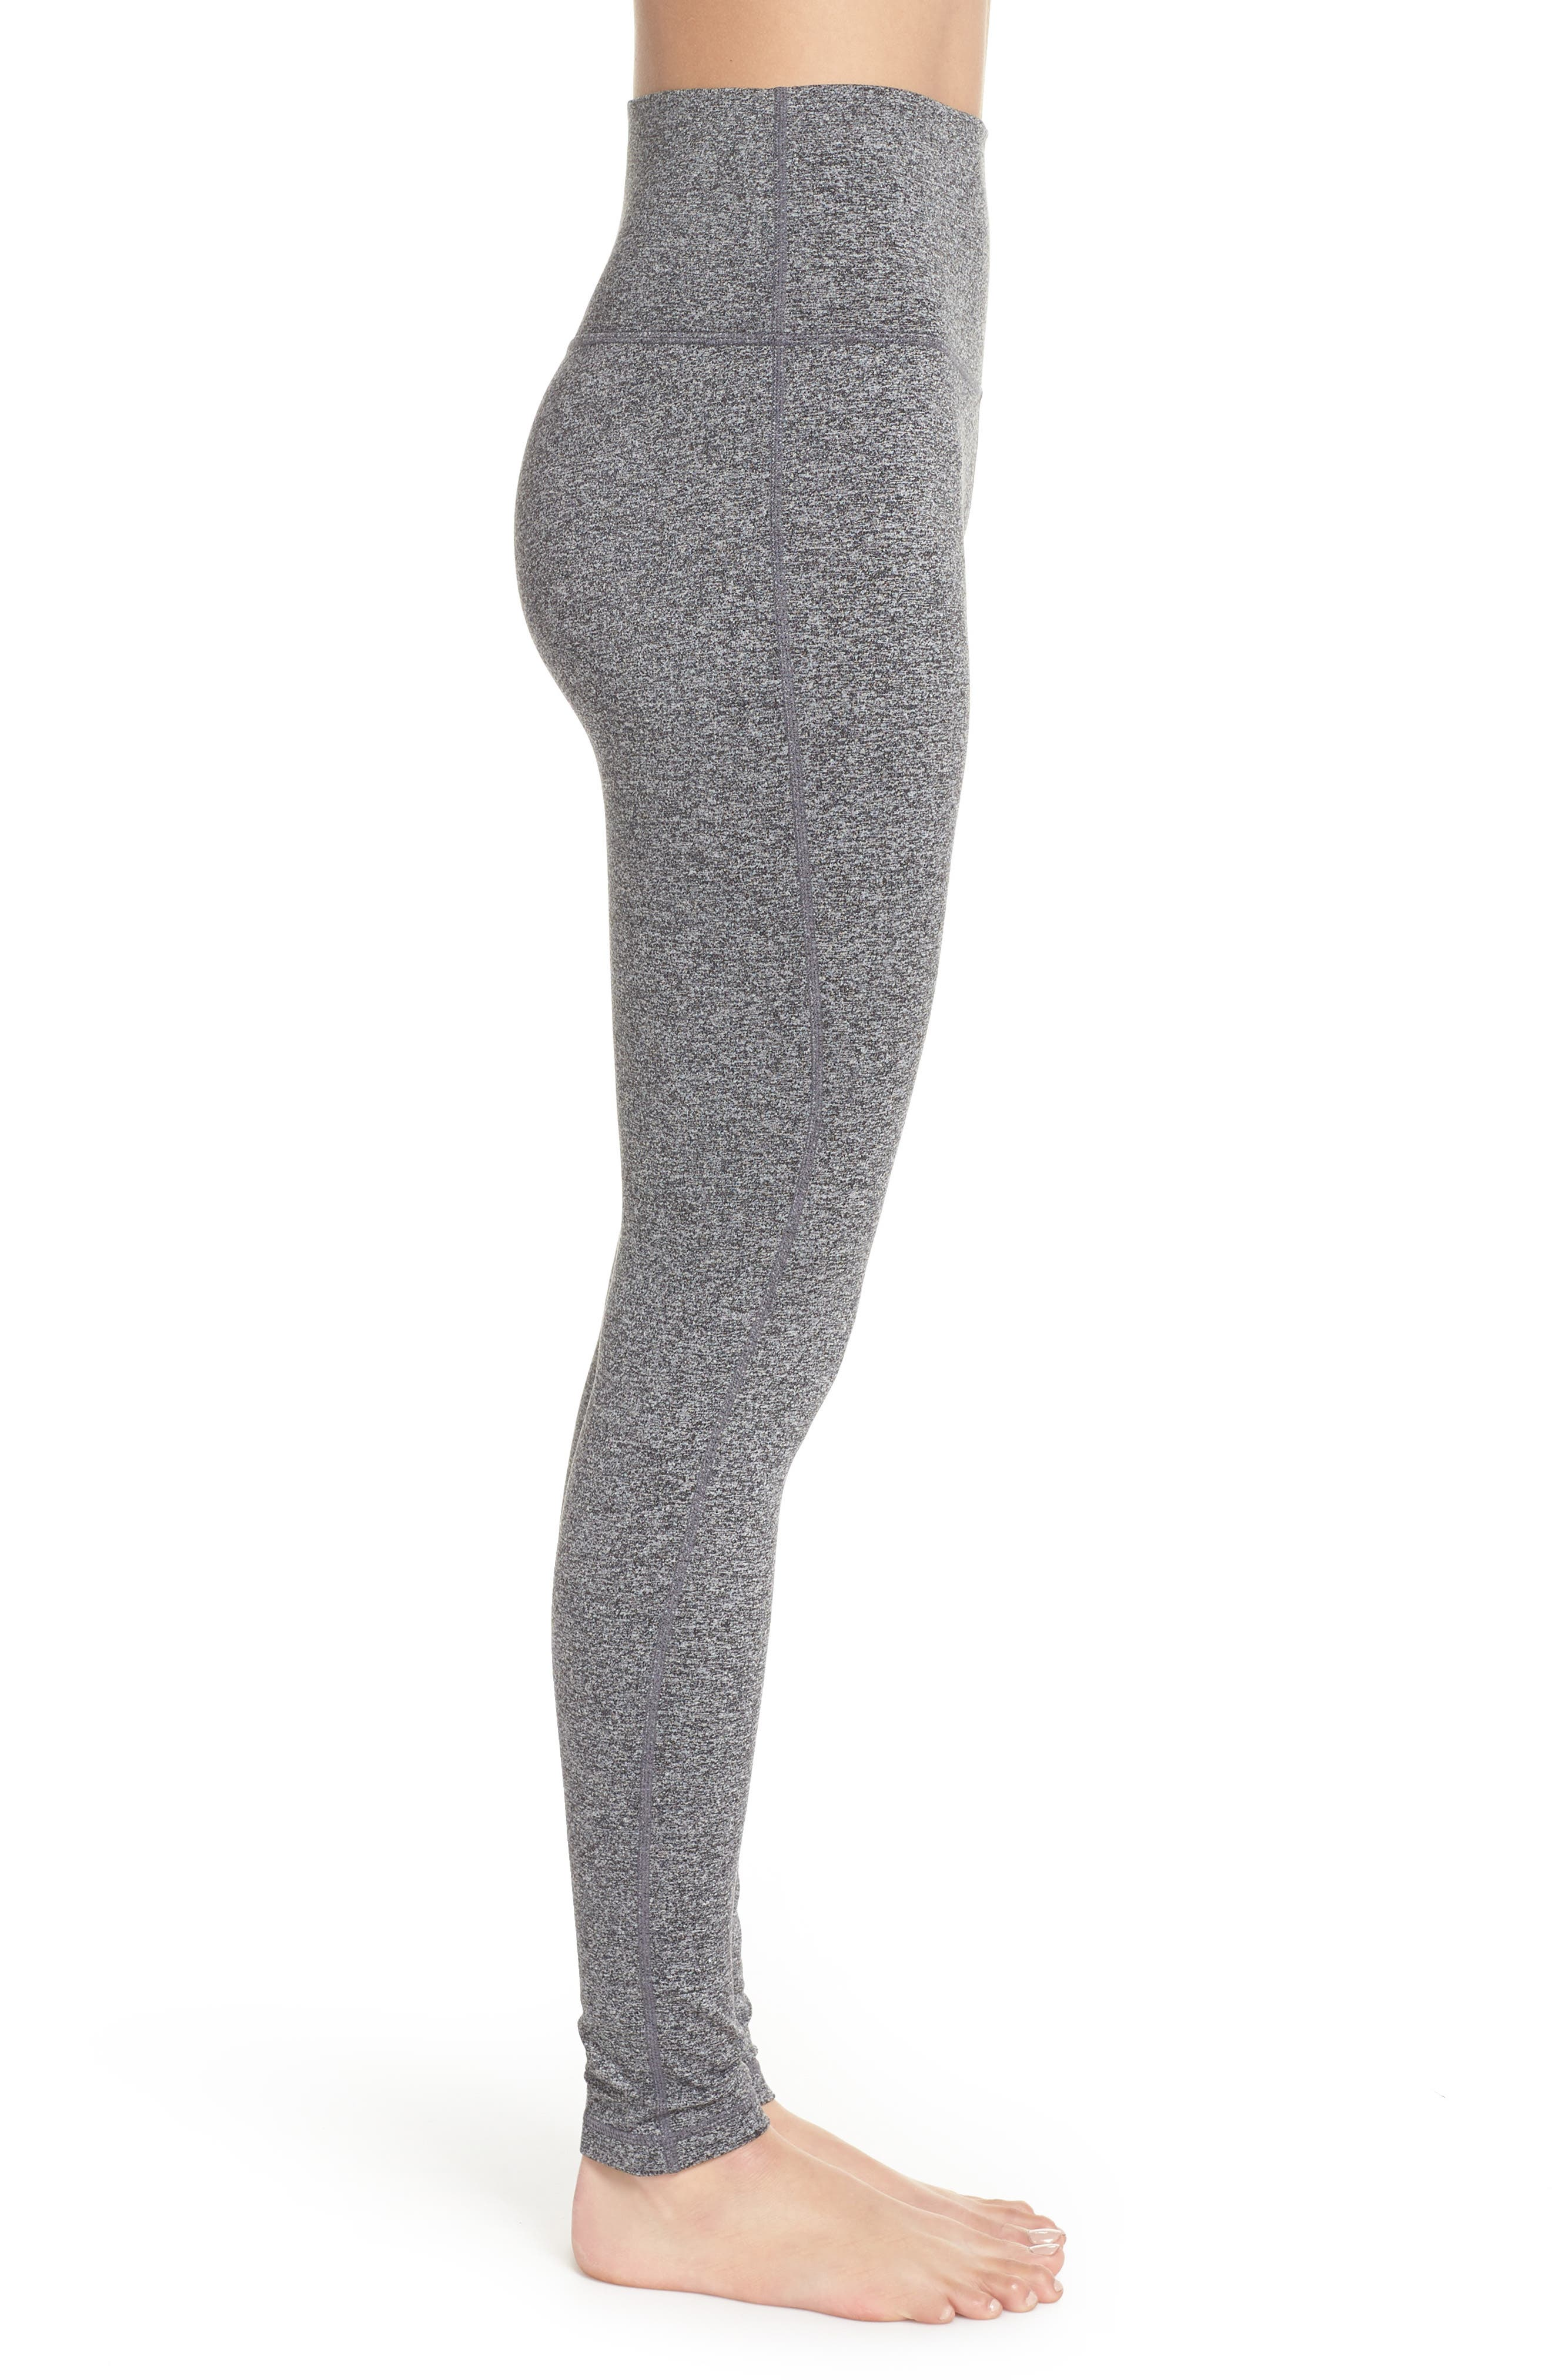 ZELLA, Ultrasoft Recycled High Waist Leggings, Alternate thumbnail 4, color, BLACK